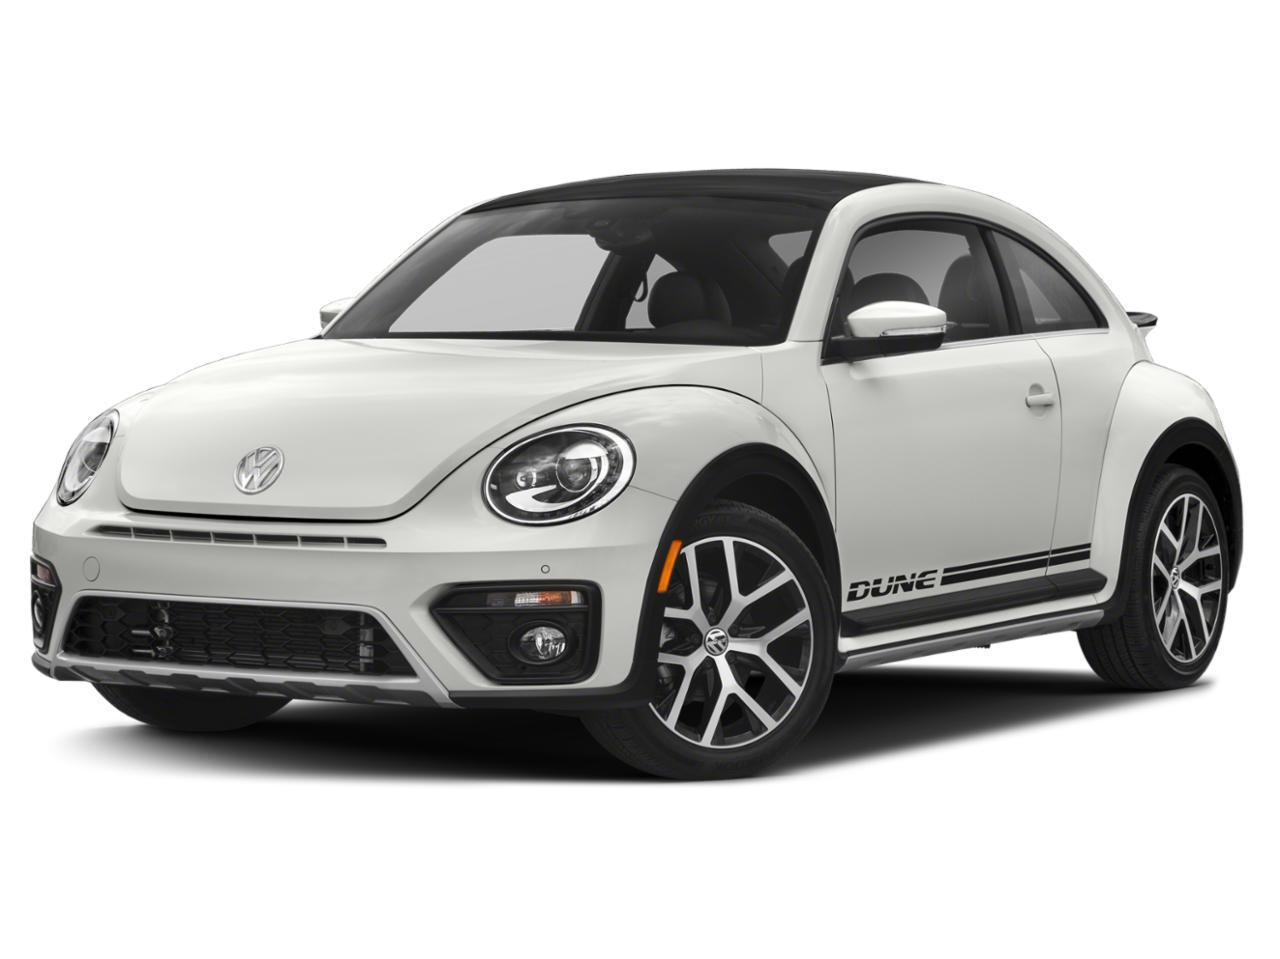 2018 Volkswagen Beetle Vehicle Photo in San Leandro, CA 94577